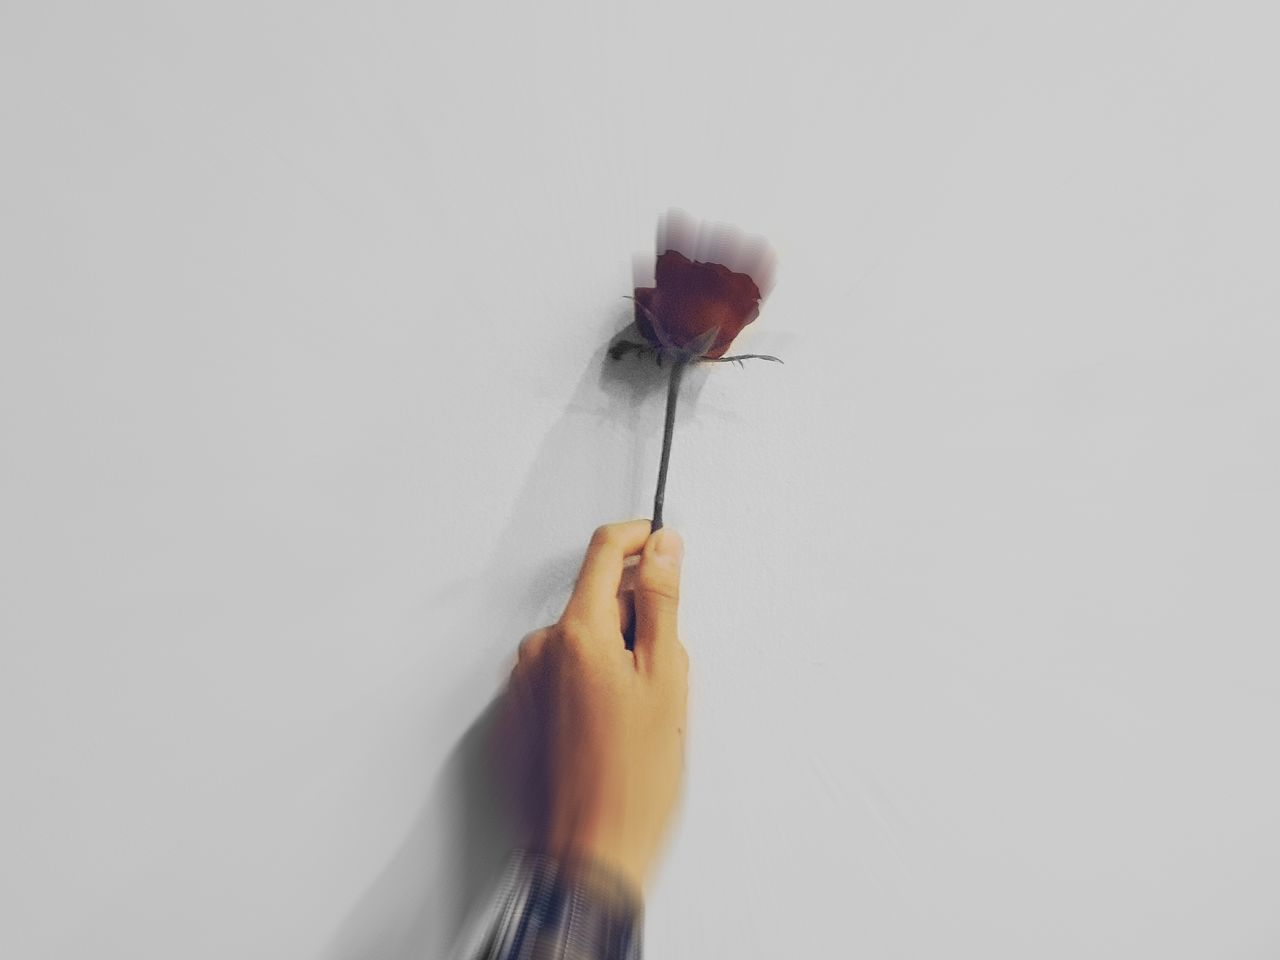 Rosé Roses Flower Hand Inframe Swatch Like4like Newbie Nature Natgeo Discovery Jakarta Cheap Goods First Eyeem Photo